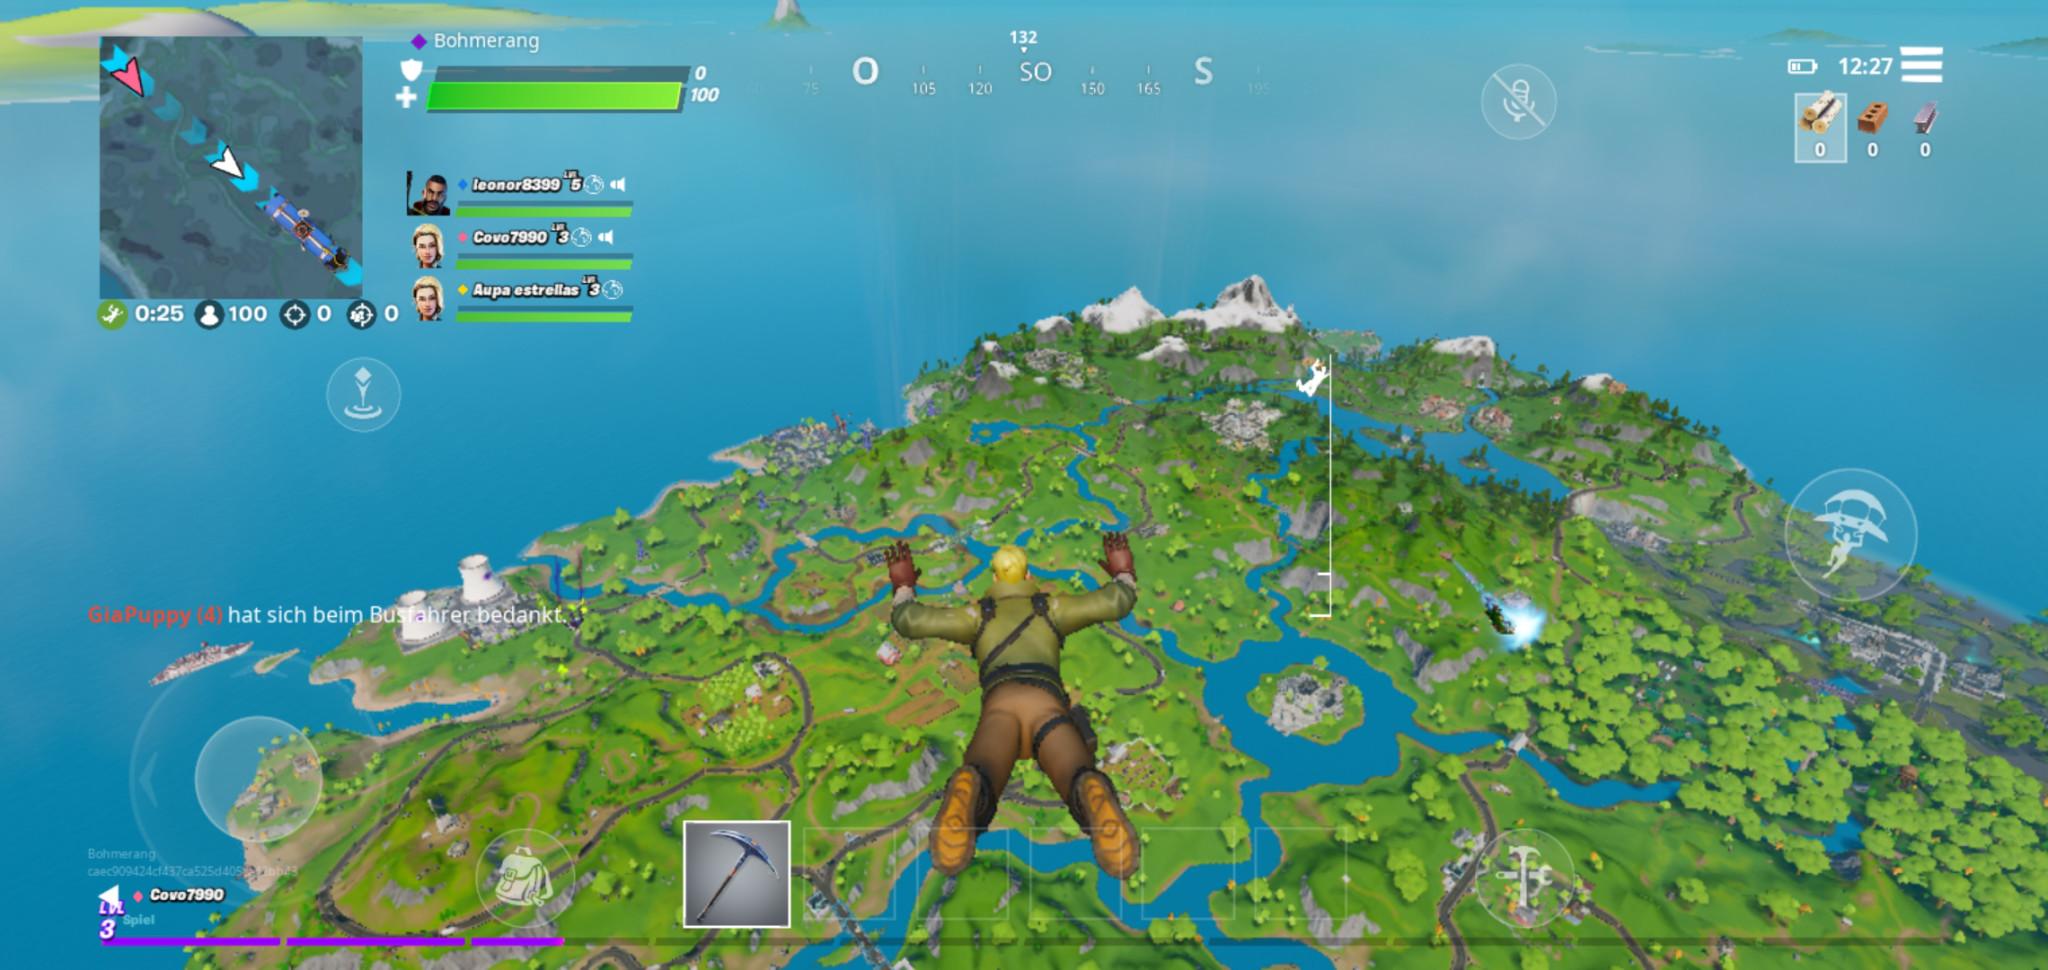 Screenshot 1 - Fortnite: Battle Royale (APK)